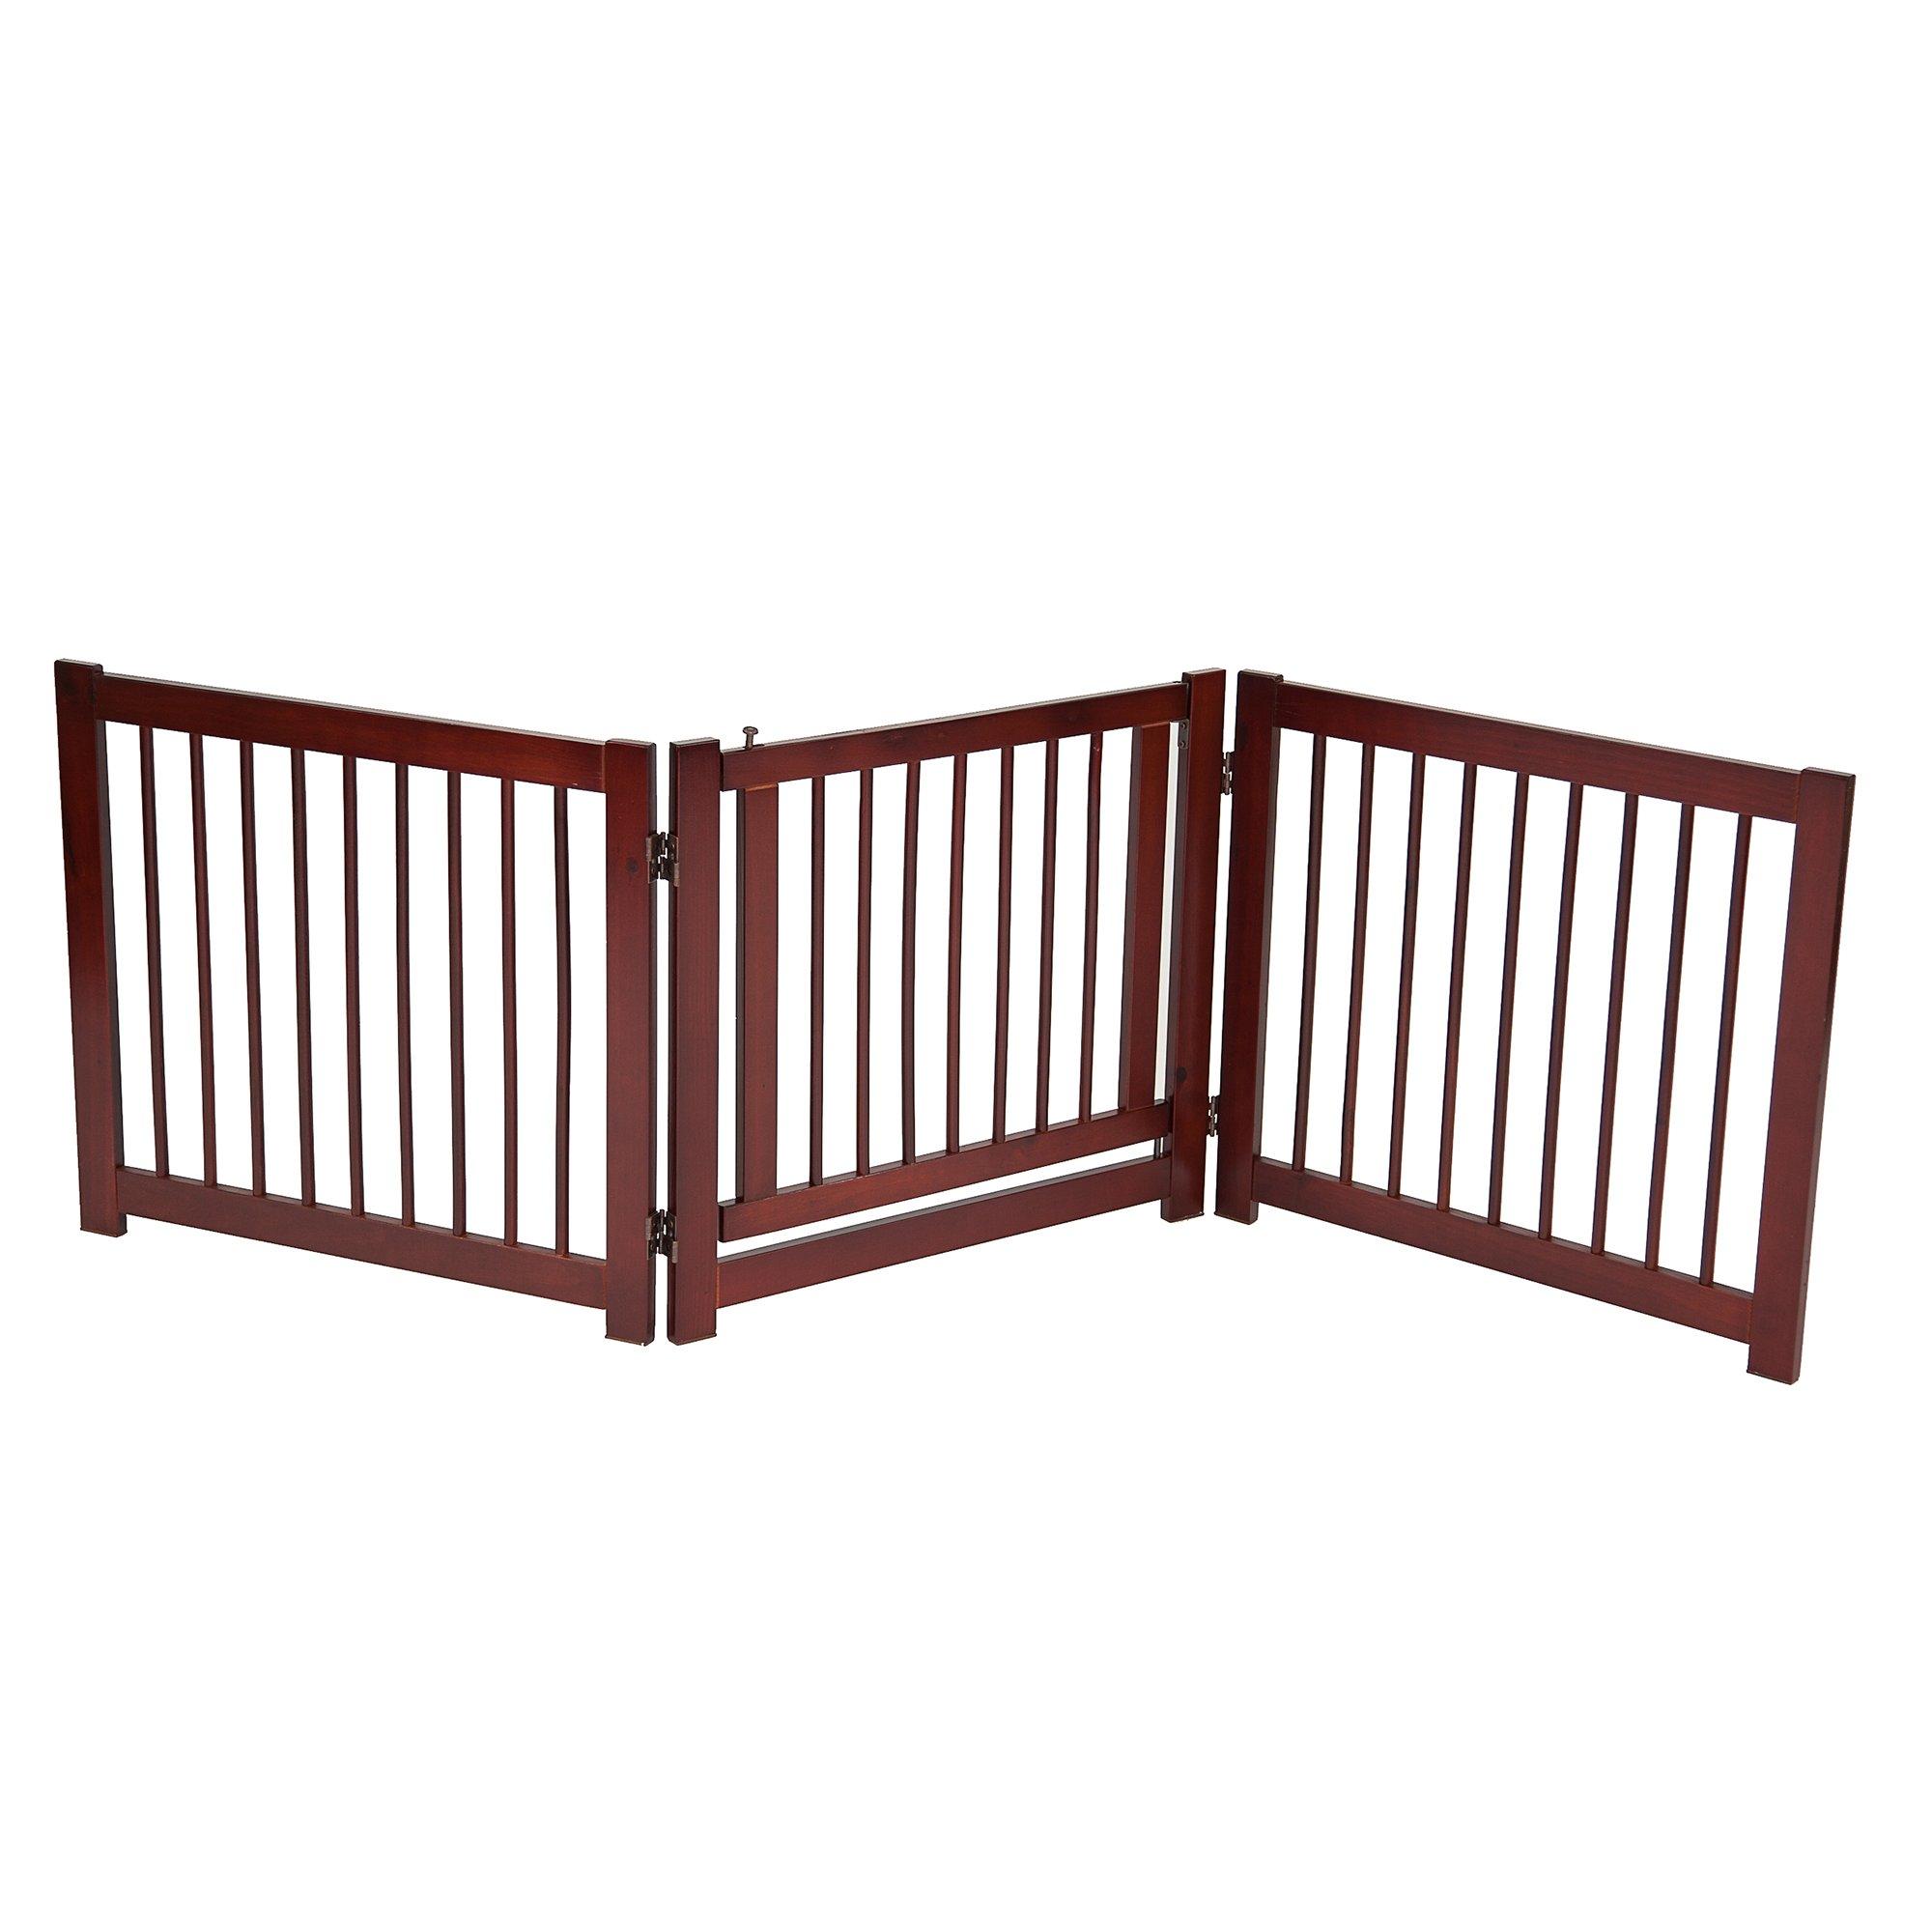 Primetime Petz 360 Configurable Pet Gate With Door 24 H Pet